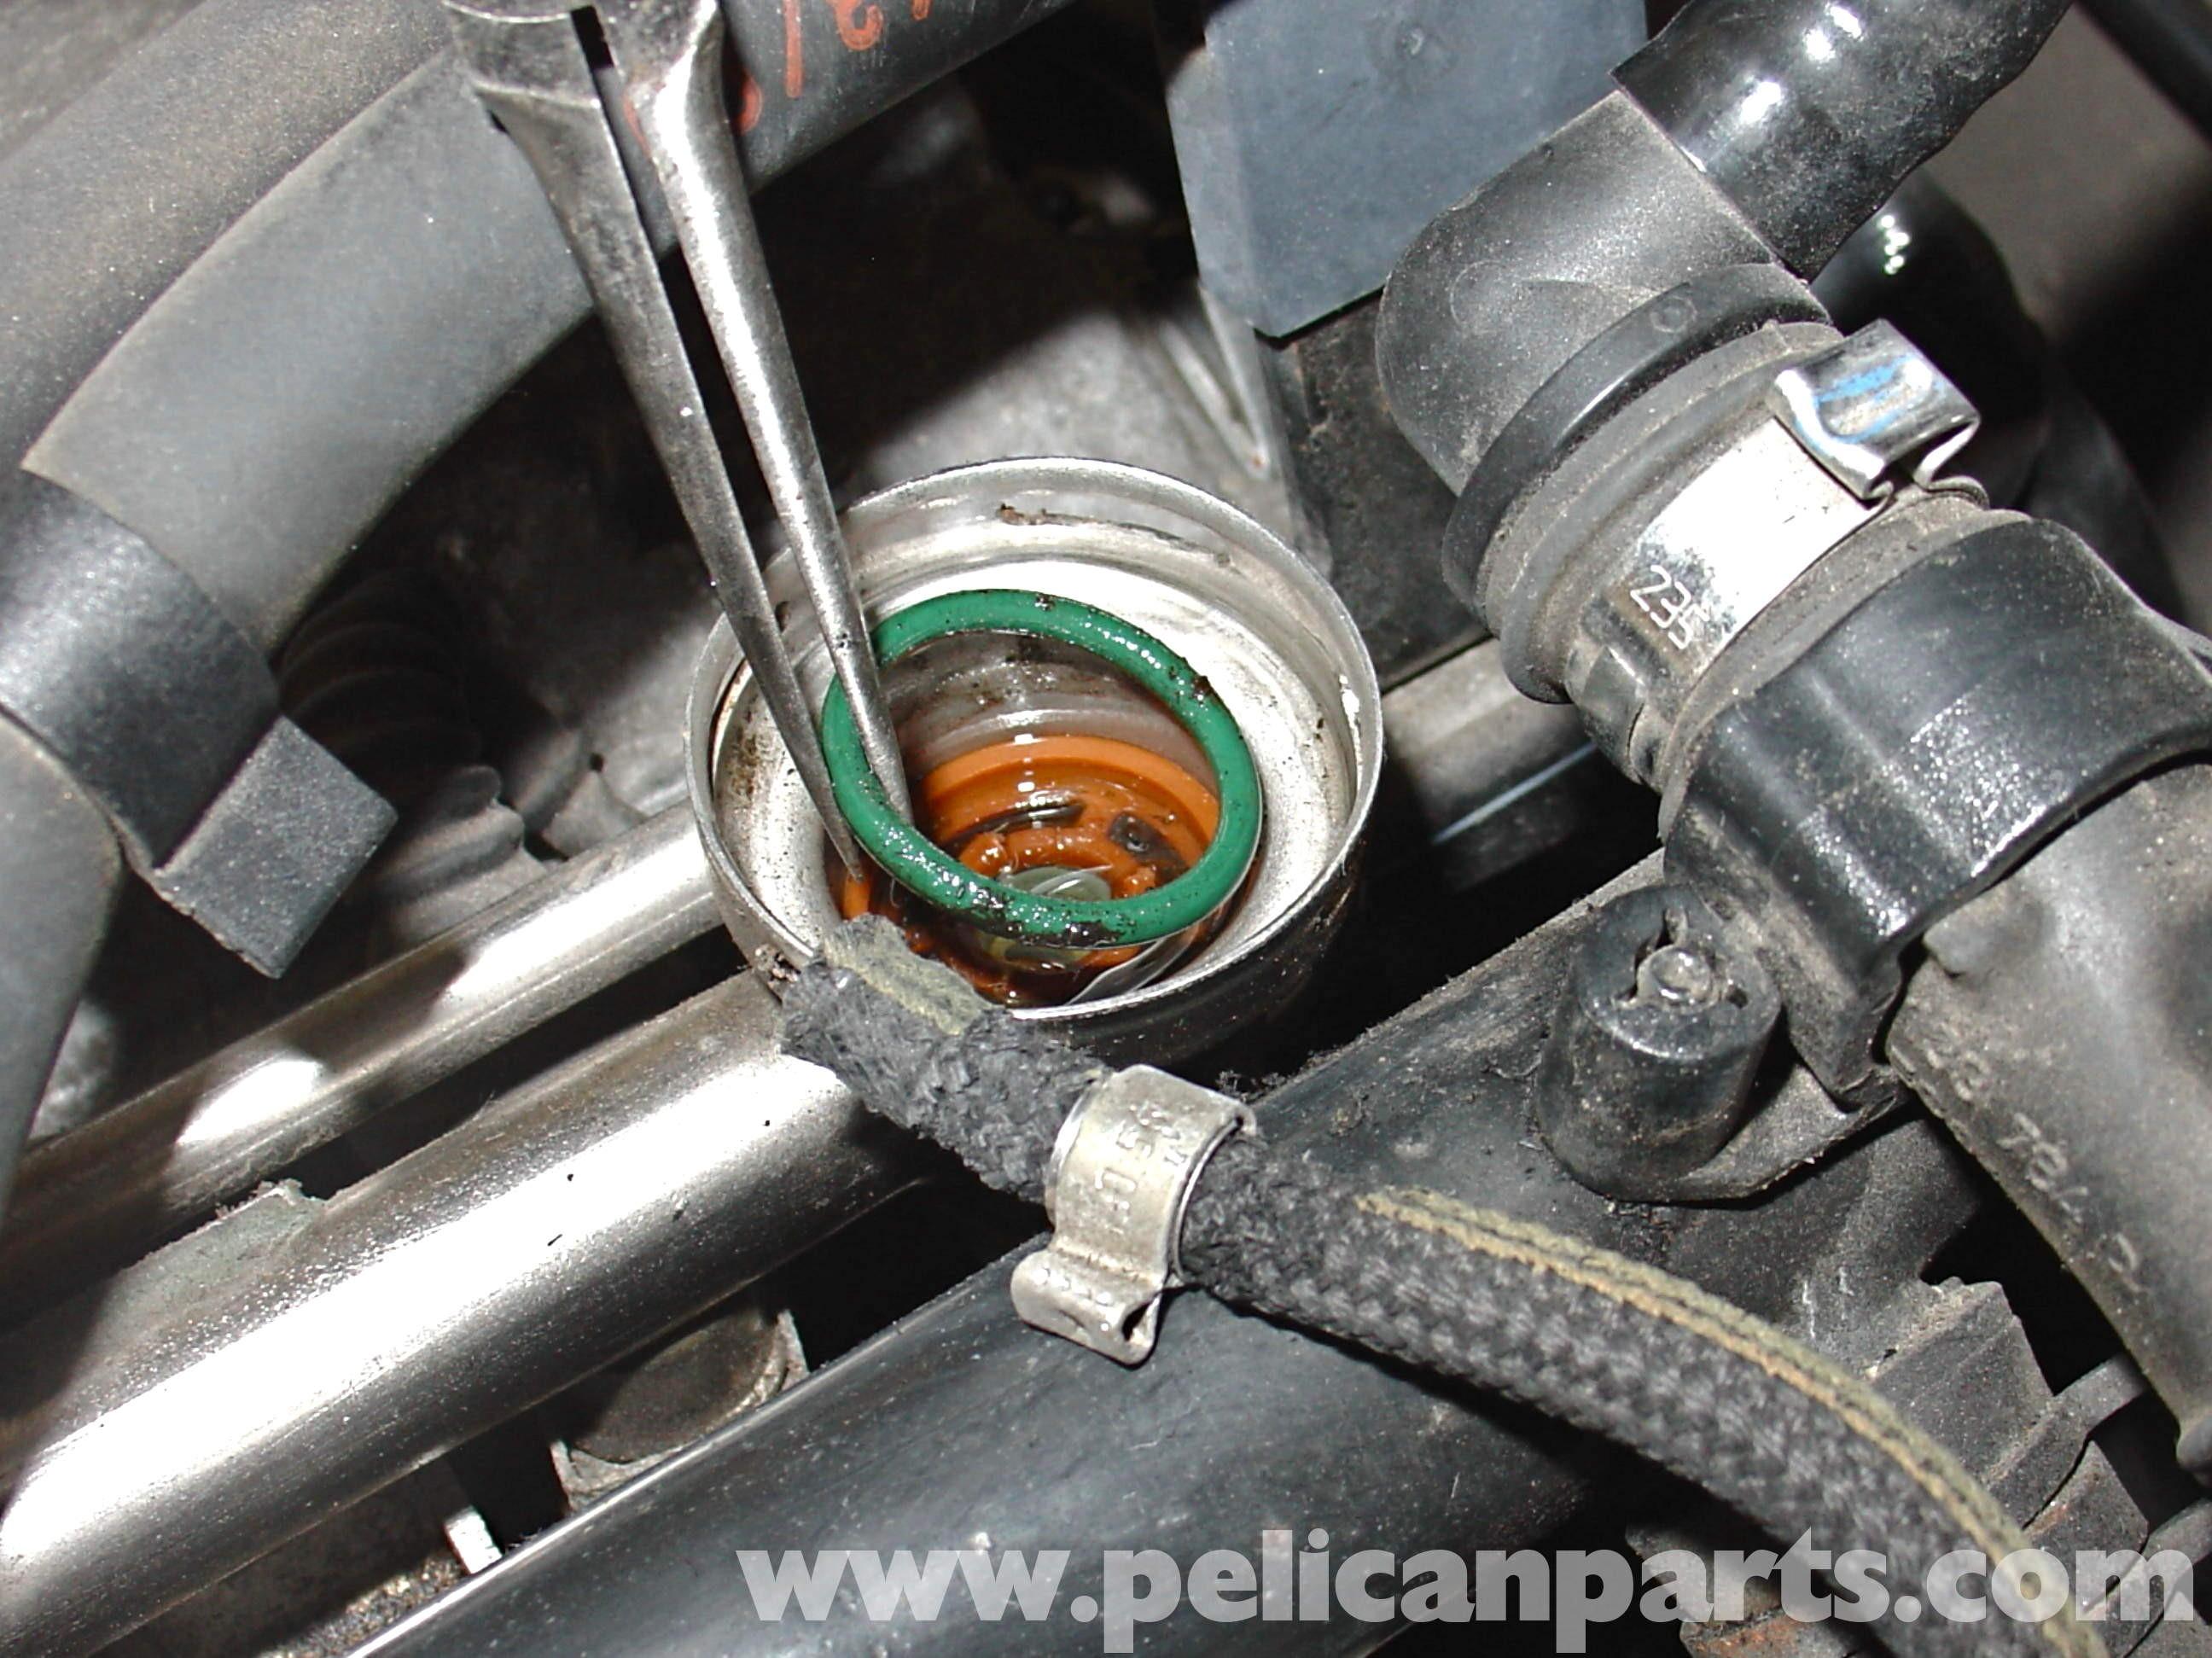 1999 Vw Passat Engine Diagram Audi A4 1 8t Volkswagen Fuel Pressure Regulator Of 1999 Vw Passat Engine Diagram